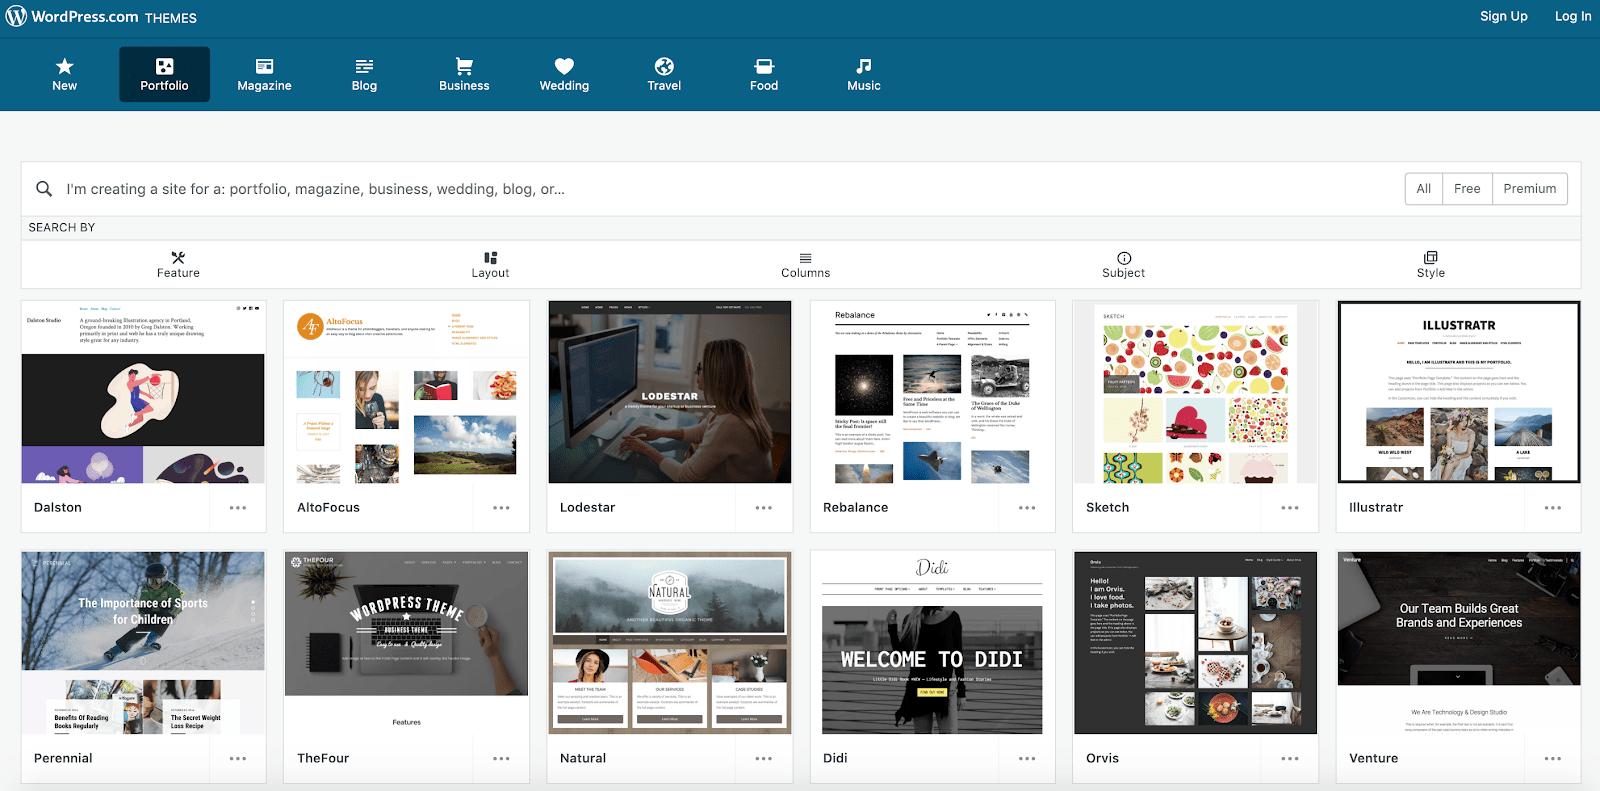 WordPress.com - templates